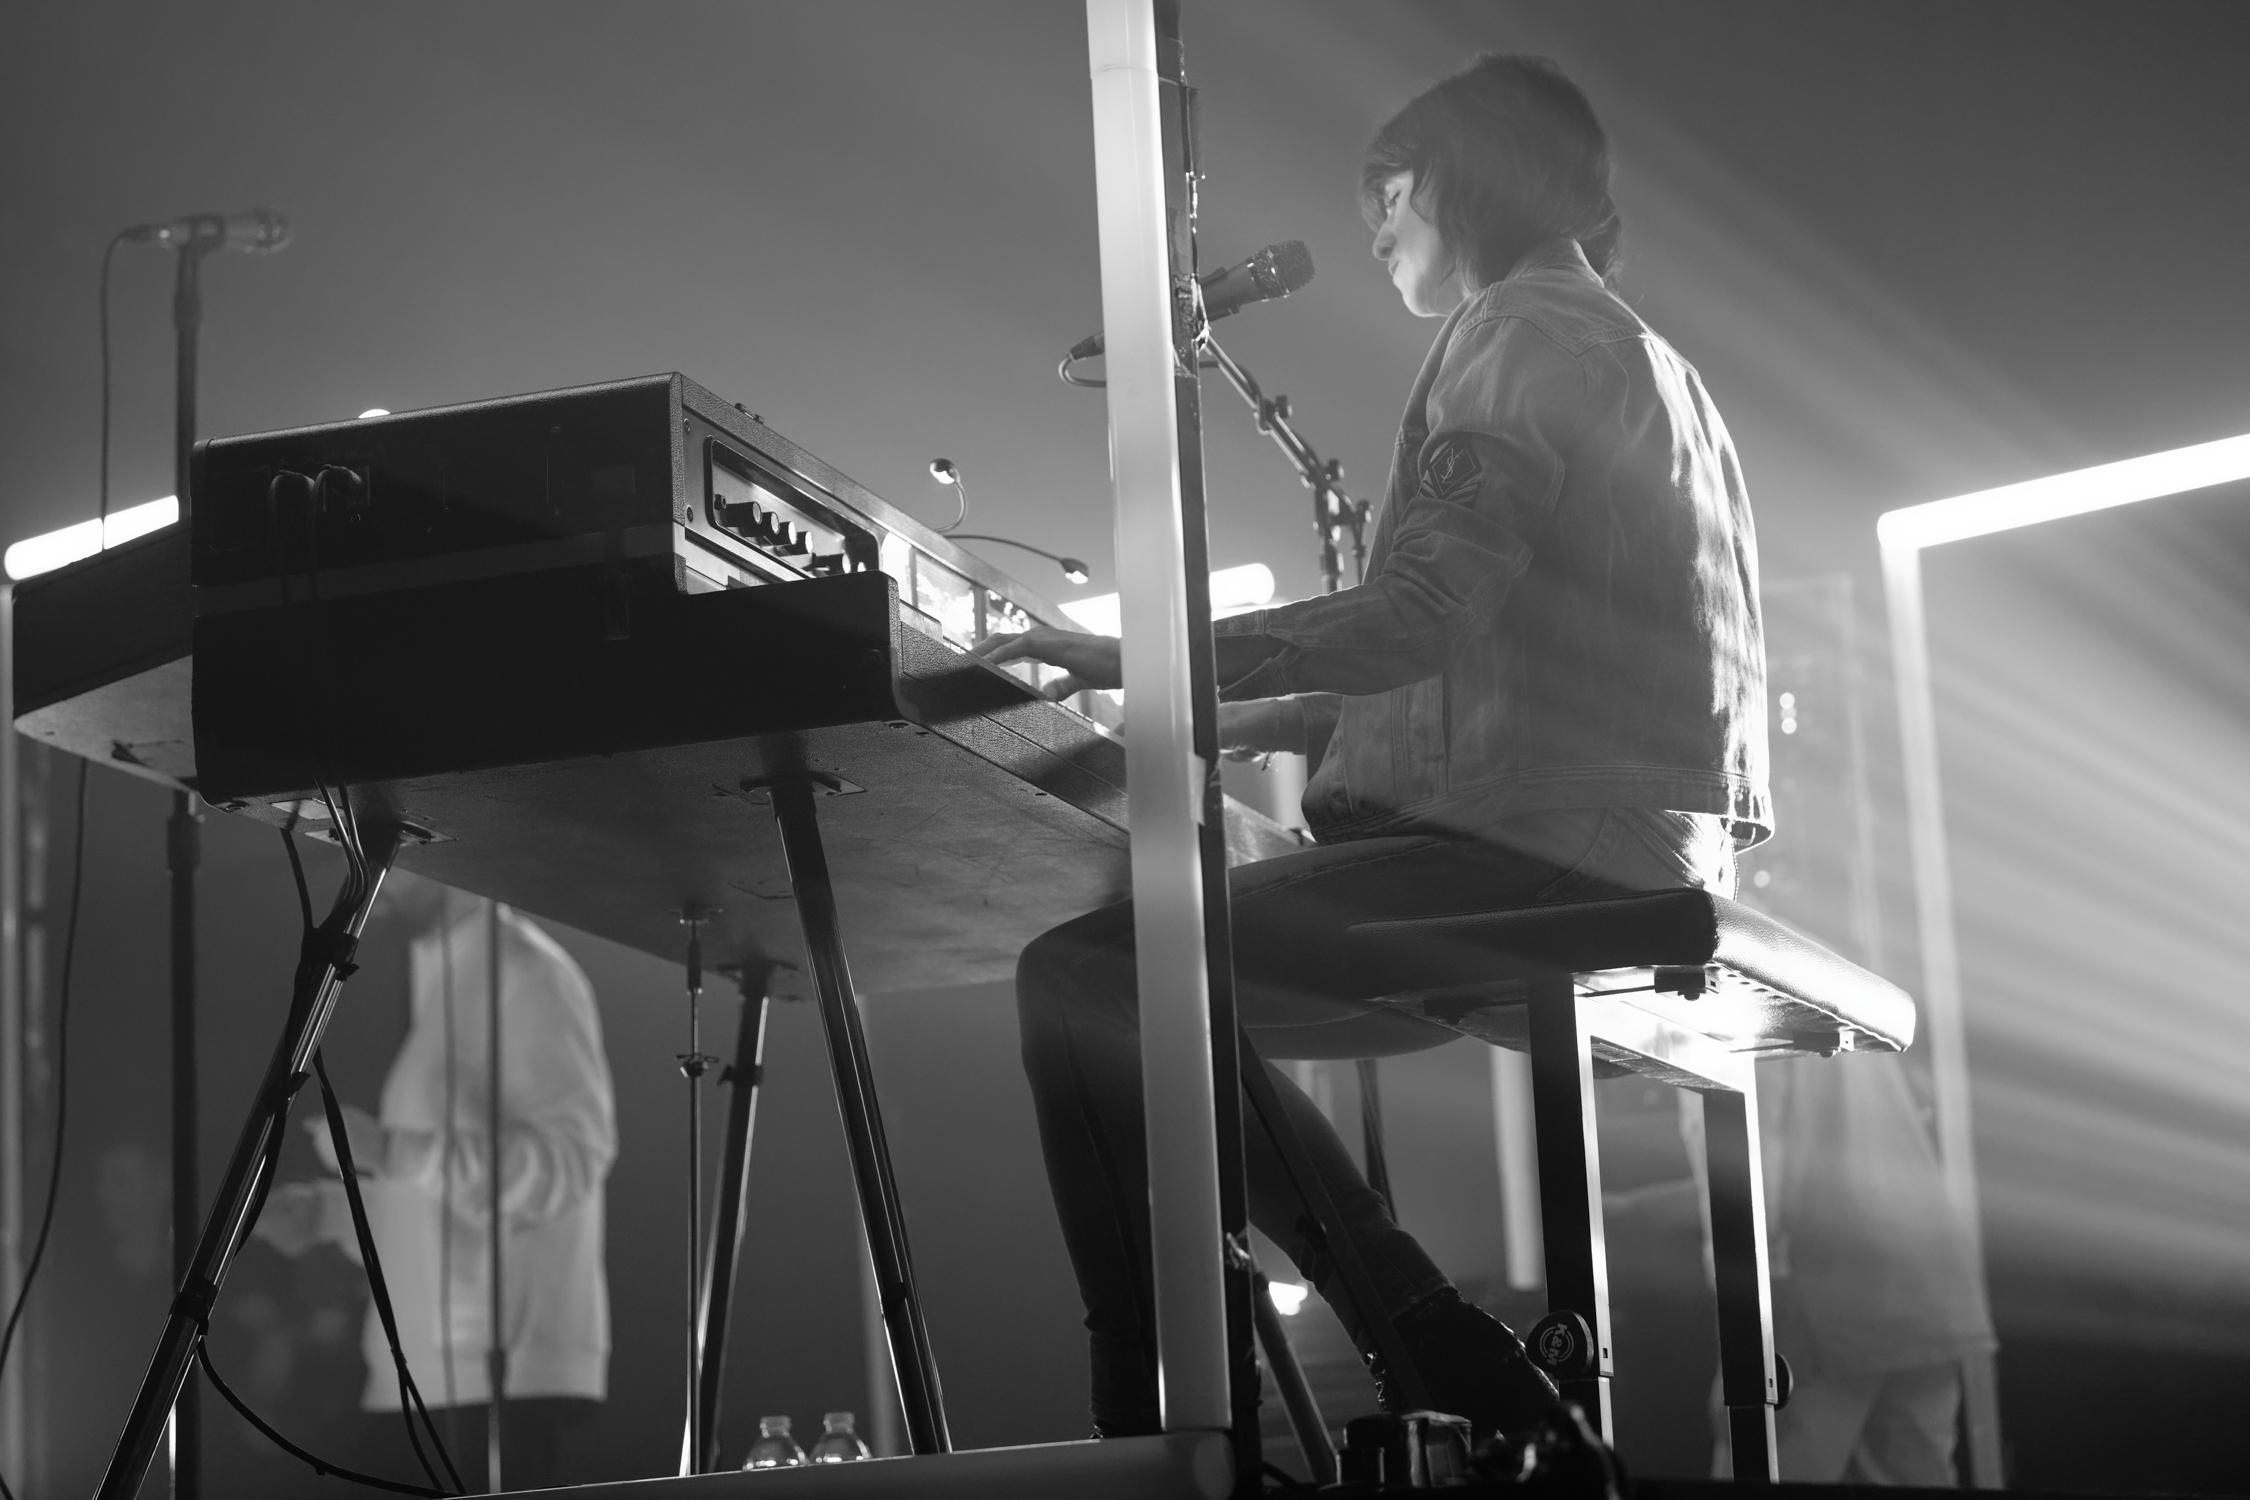 20190415 262 The Regency Ballroom - Charlotte Gainsbourg by Jon Bauer.jpg